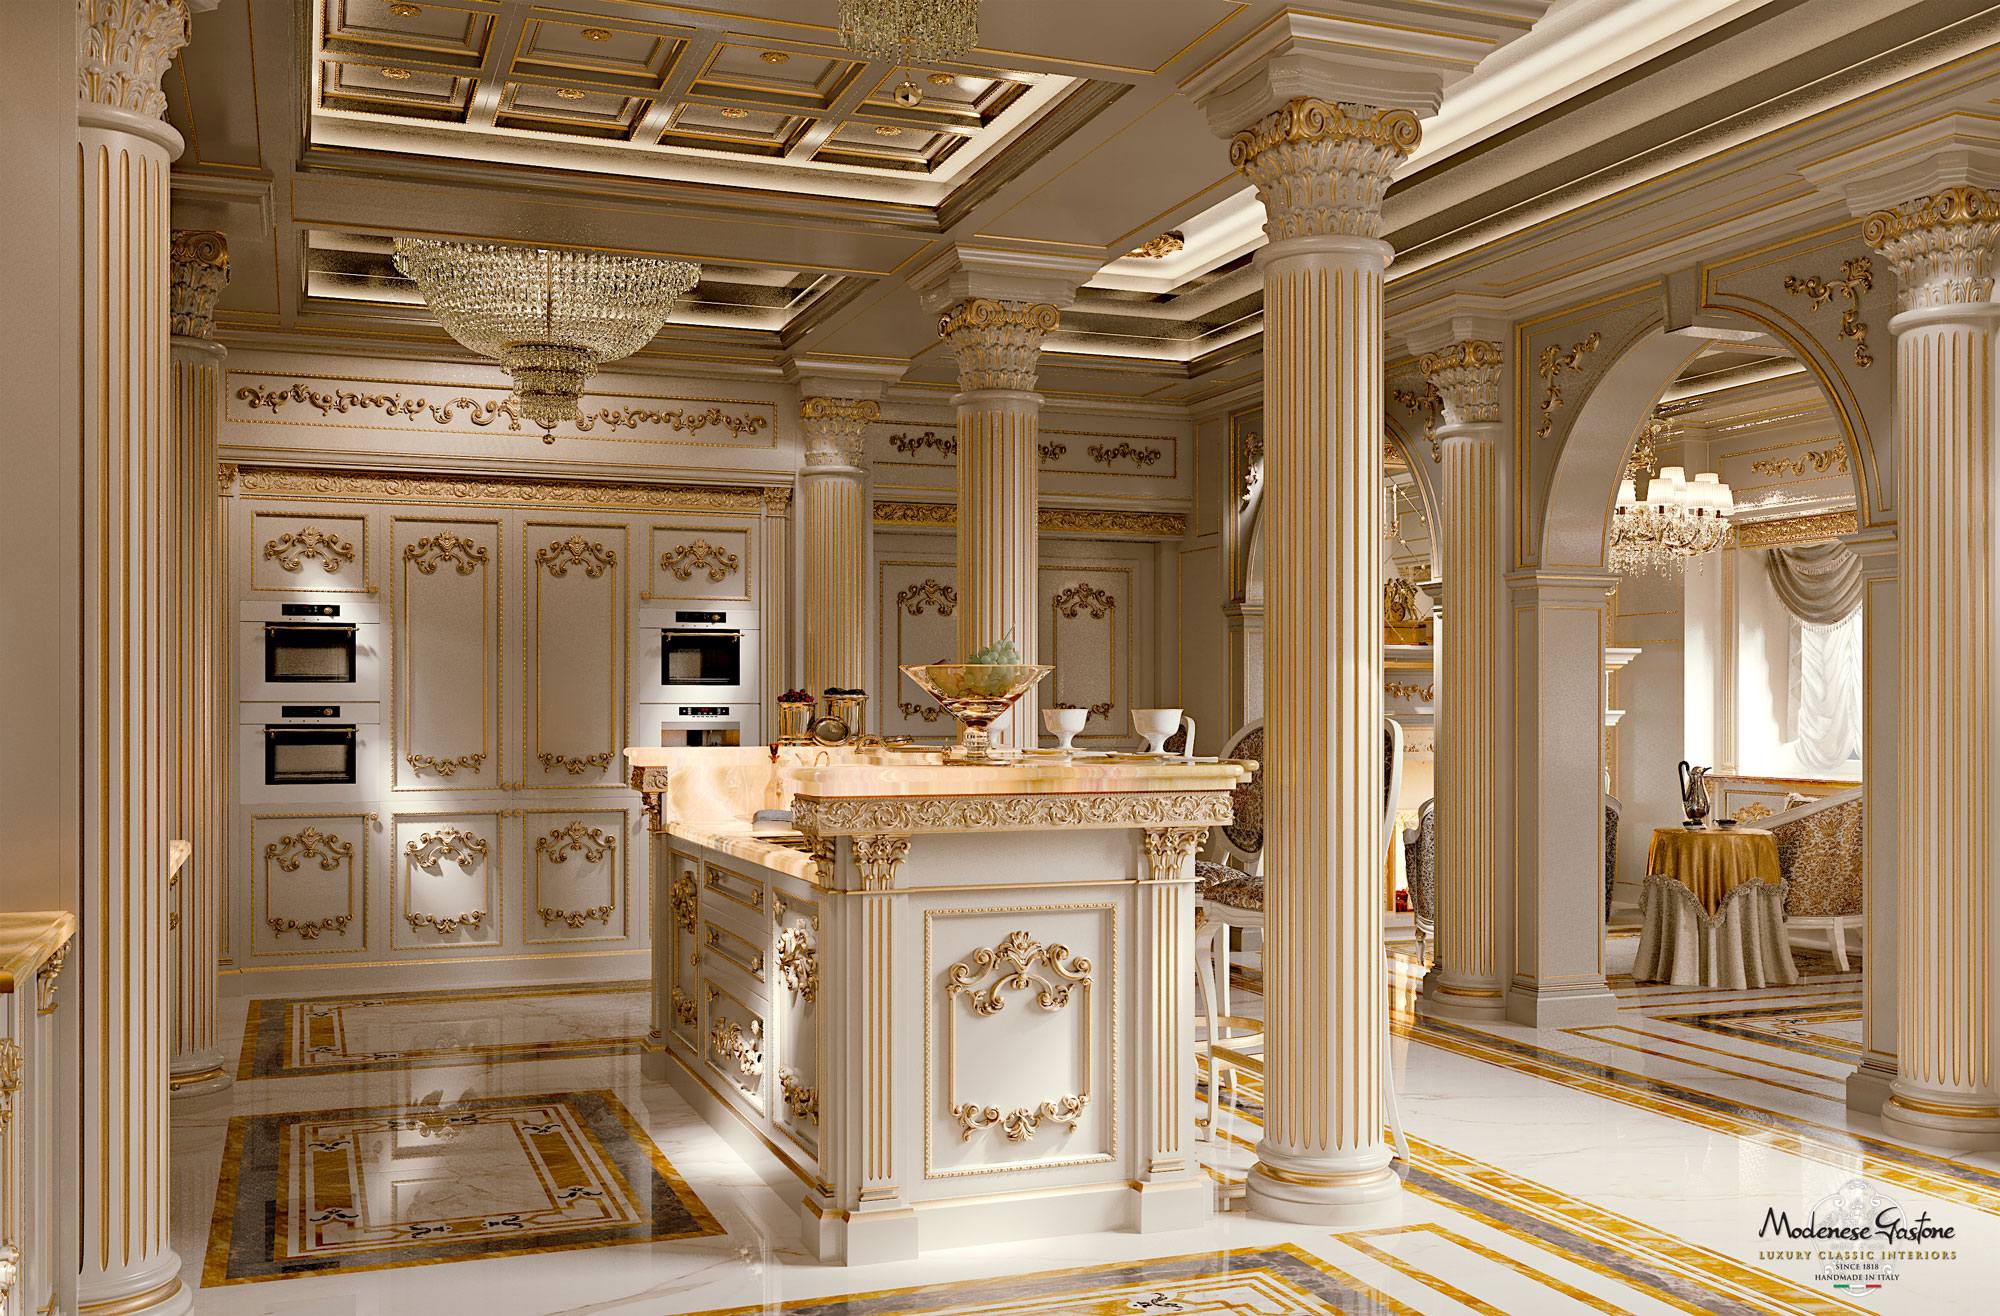 Free Photo Royal Kitchen Architect Kitchen Stock